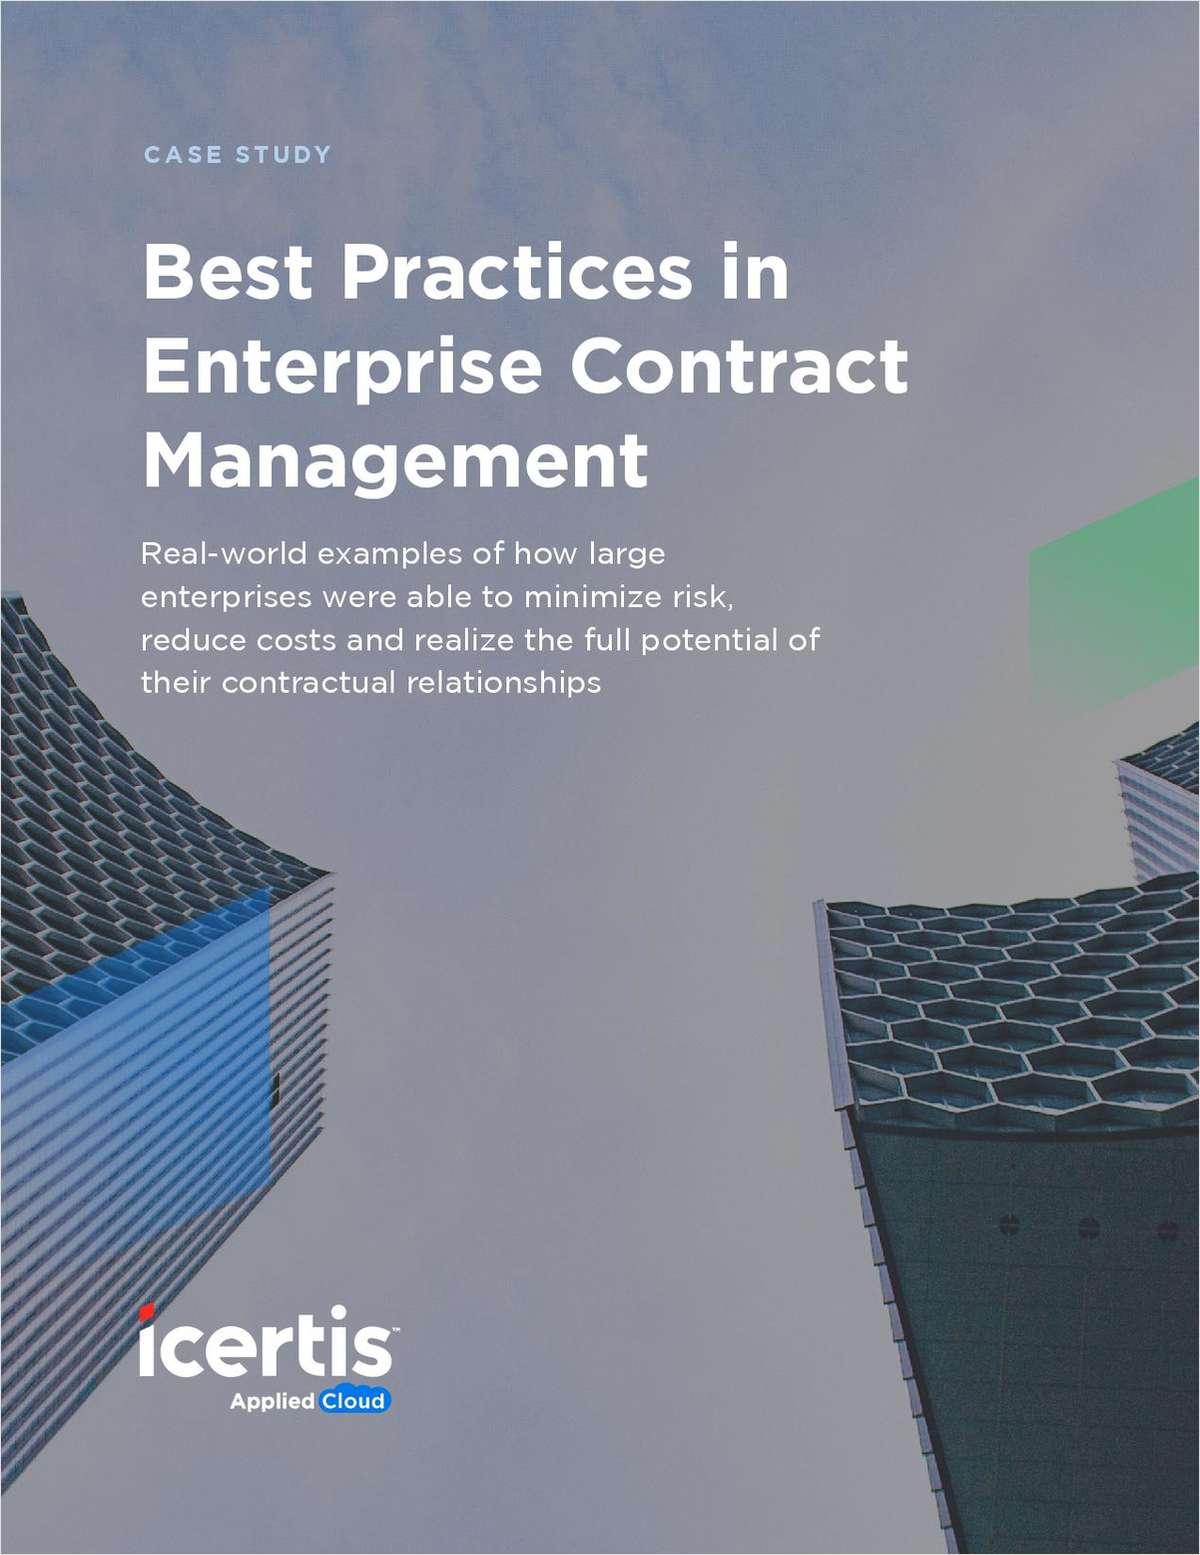 Best Practices in Enterprise Contract Management